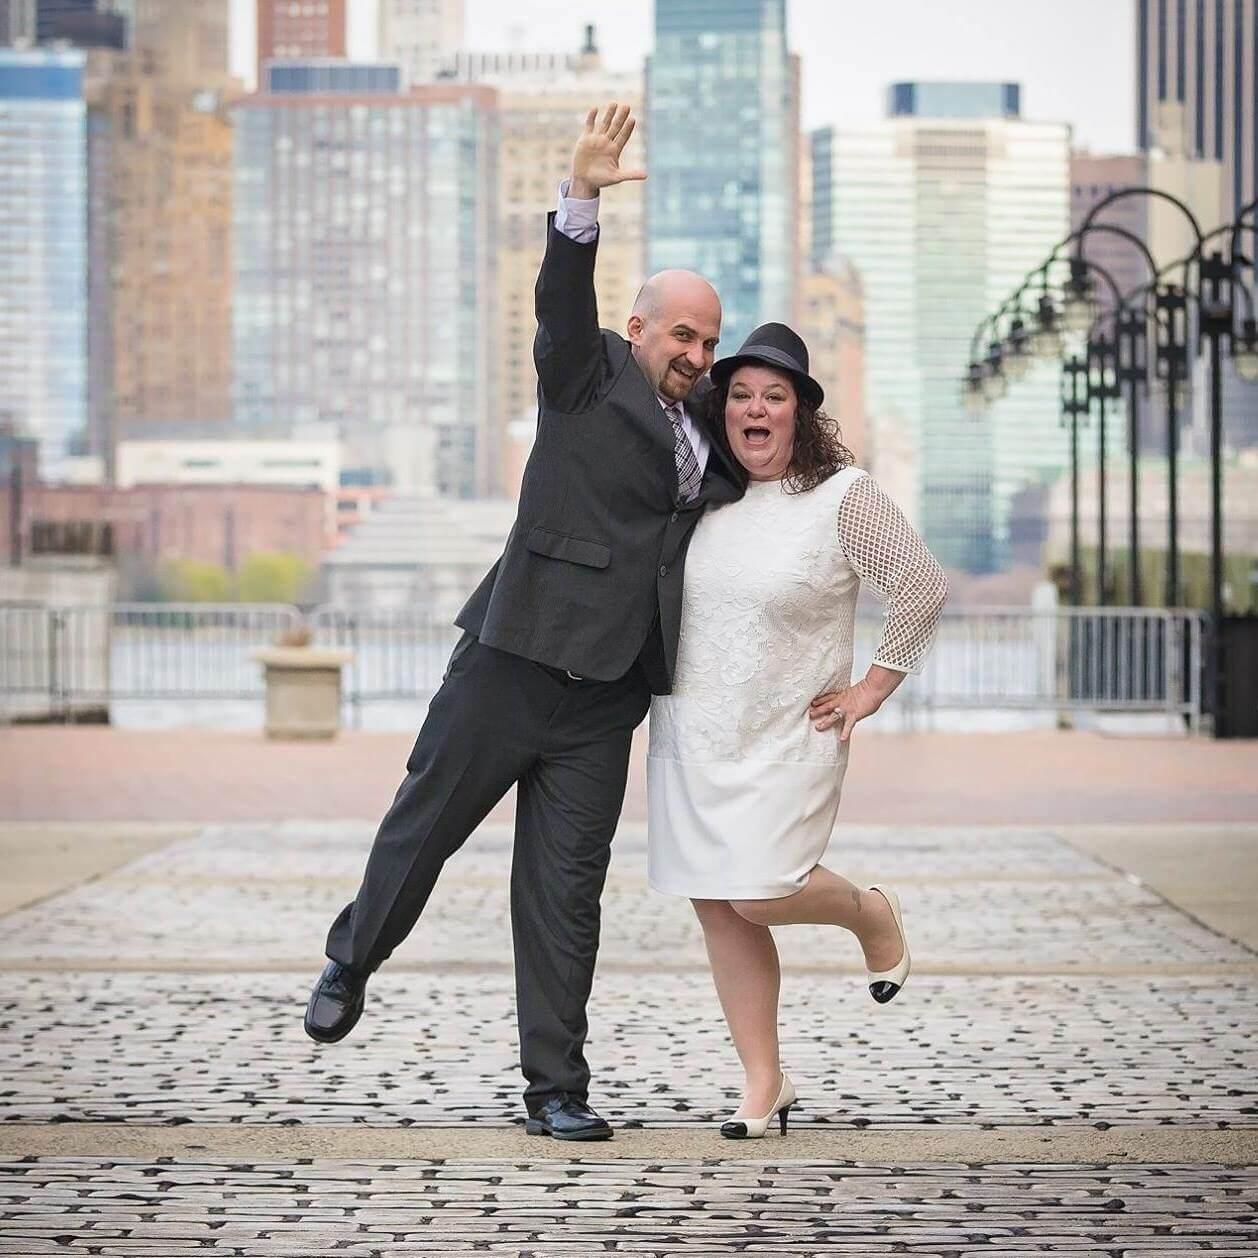 Wedding. Cancer. Divorce